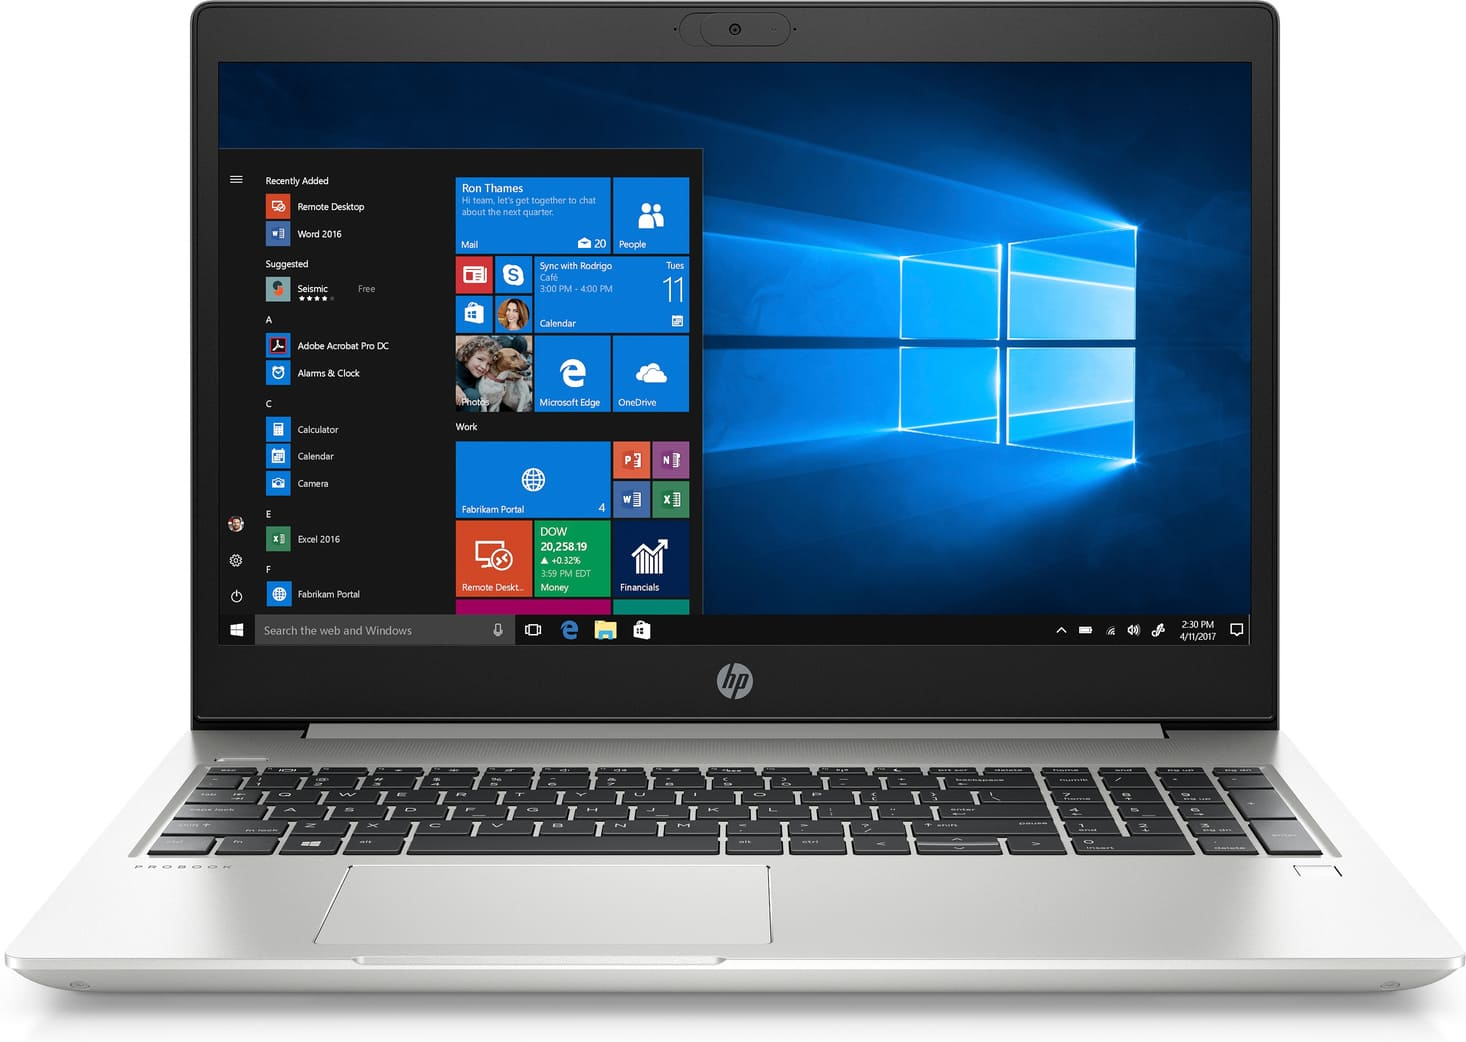 HP ProBook 450 G7 15,6'' FHD 250nts i3-10110U/8GB/256GB M.2/WiFi/BT/W10Pro - 8MH53EA#BCM